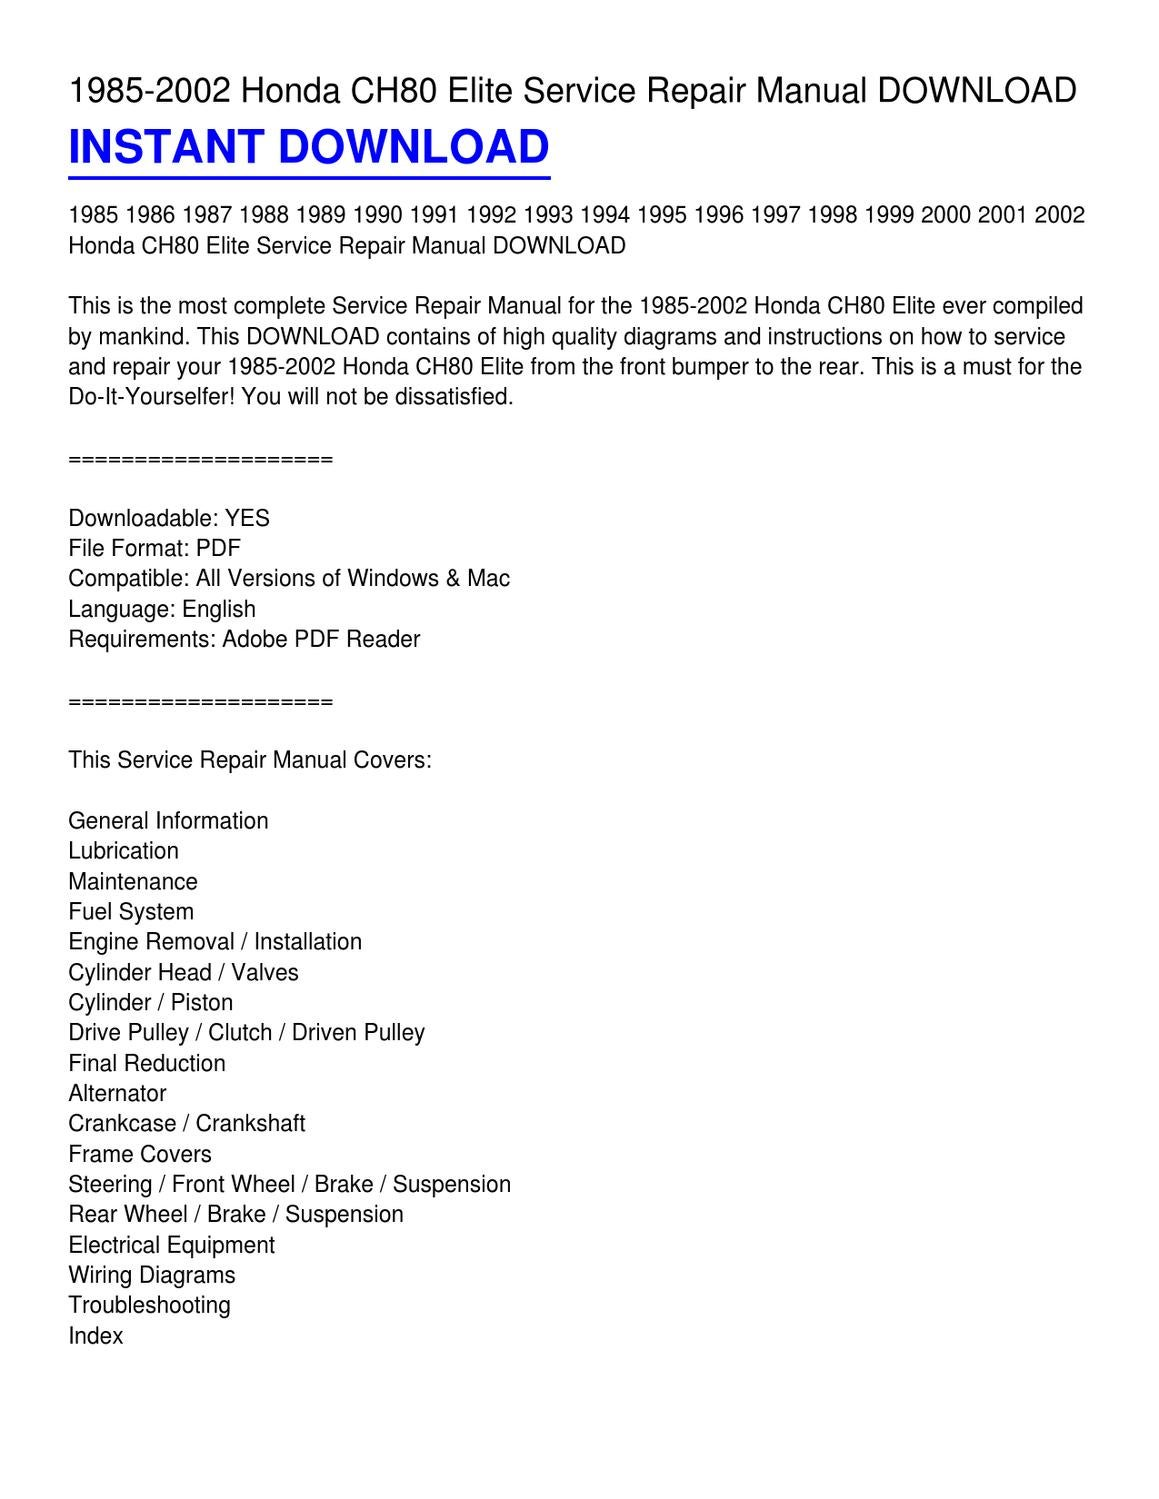 pdfscooter scootermasters text document  virtually aero  85aero80rightside-3-3-3-2  honda factory service manual 1985 2006 ch80  elite service  honda chf50